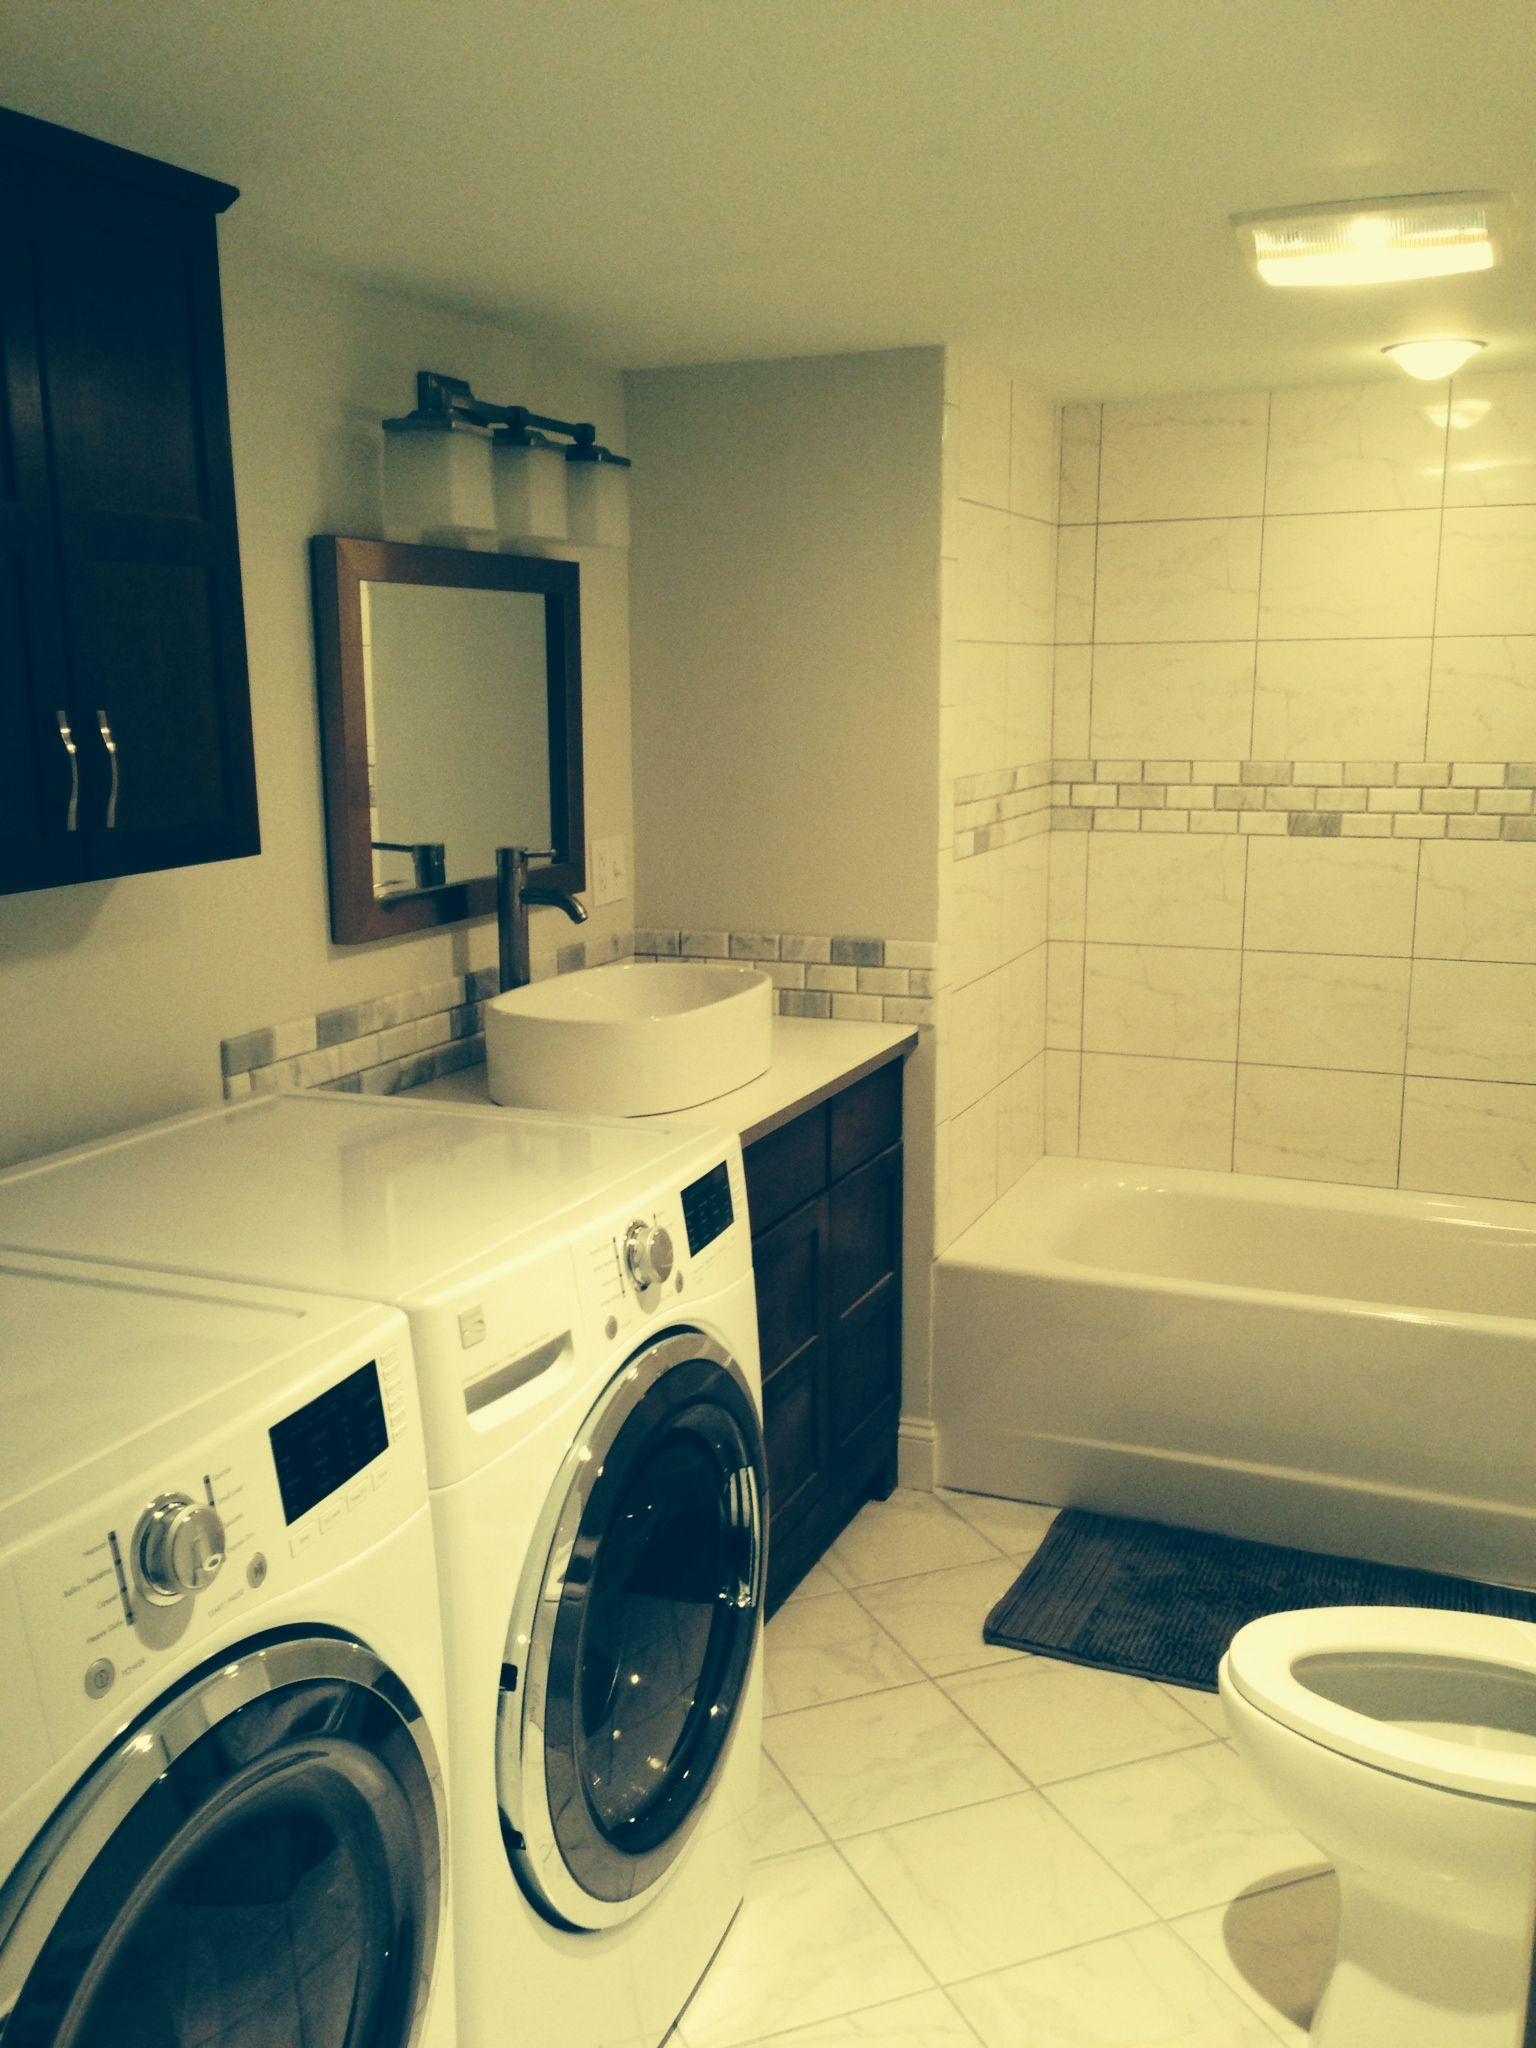 21 Best Basement Laundry Room Design Ideas for You | Basement ...